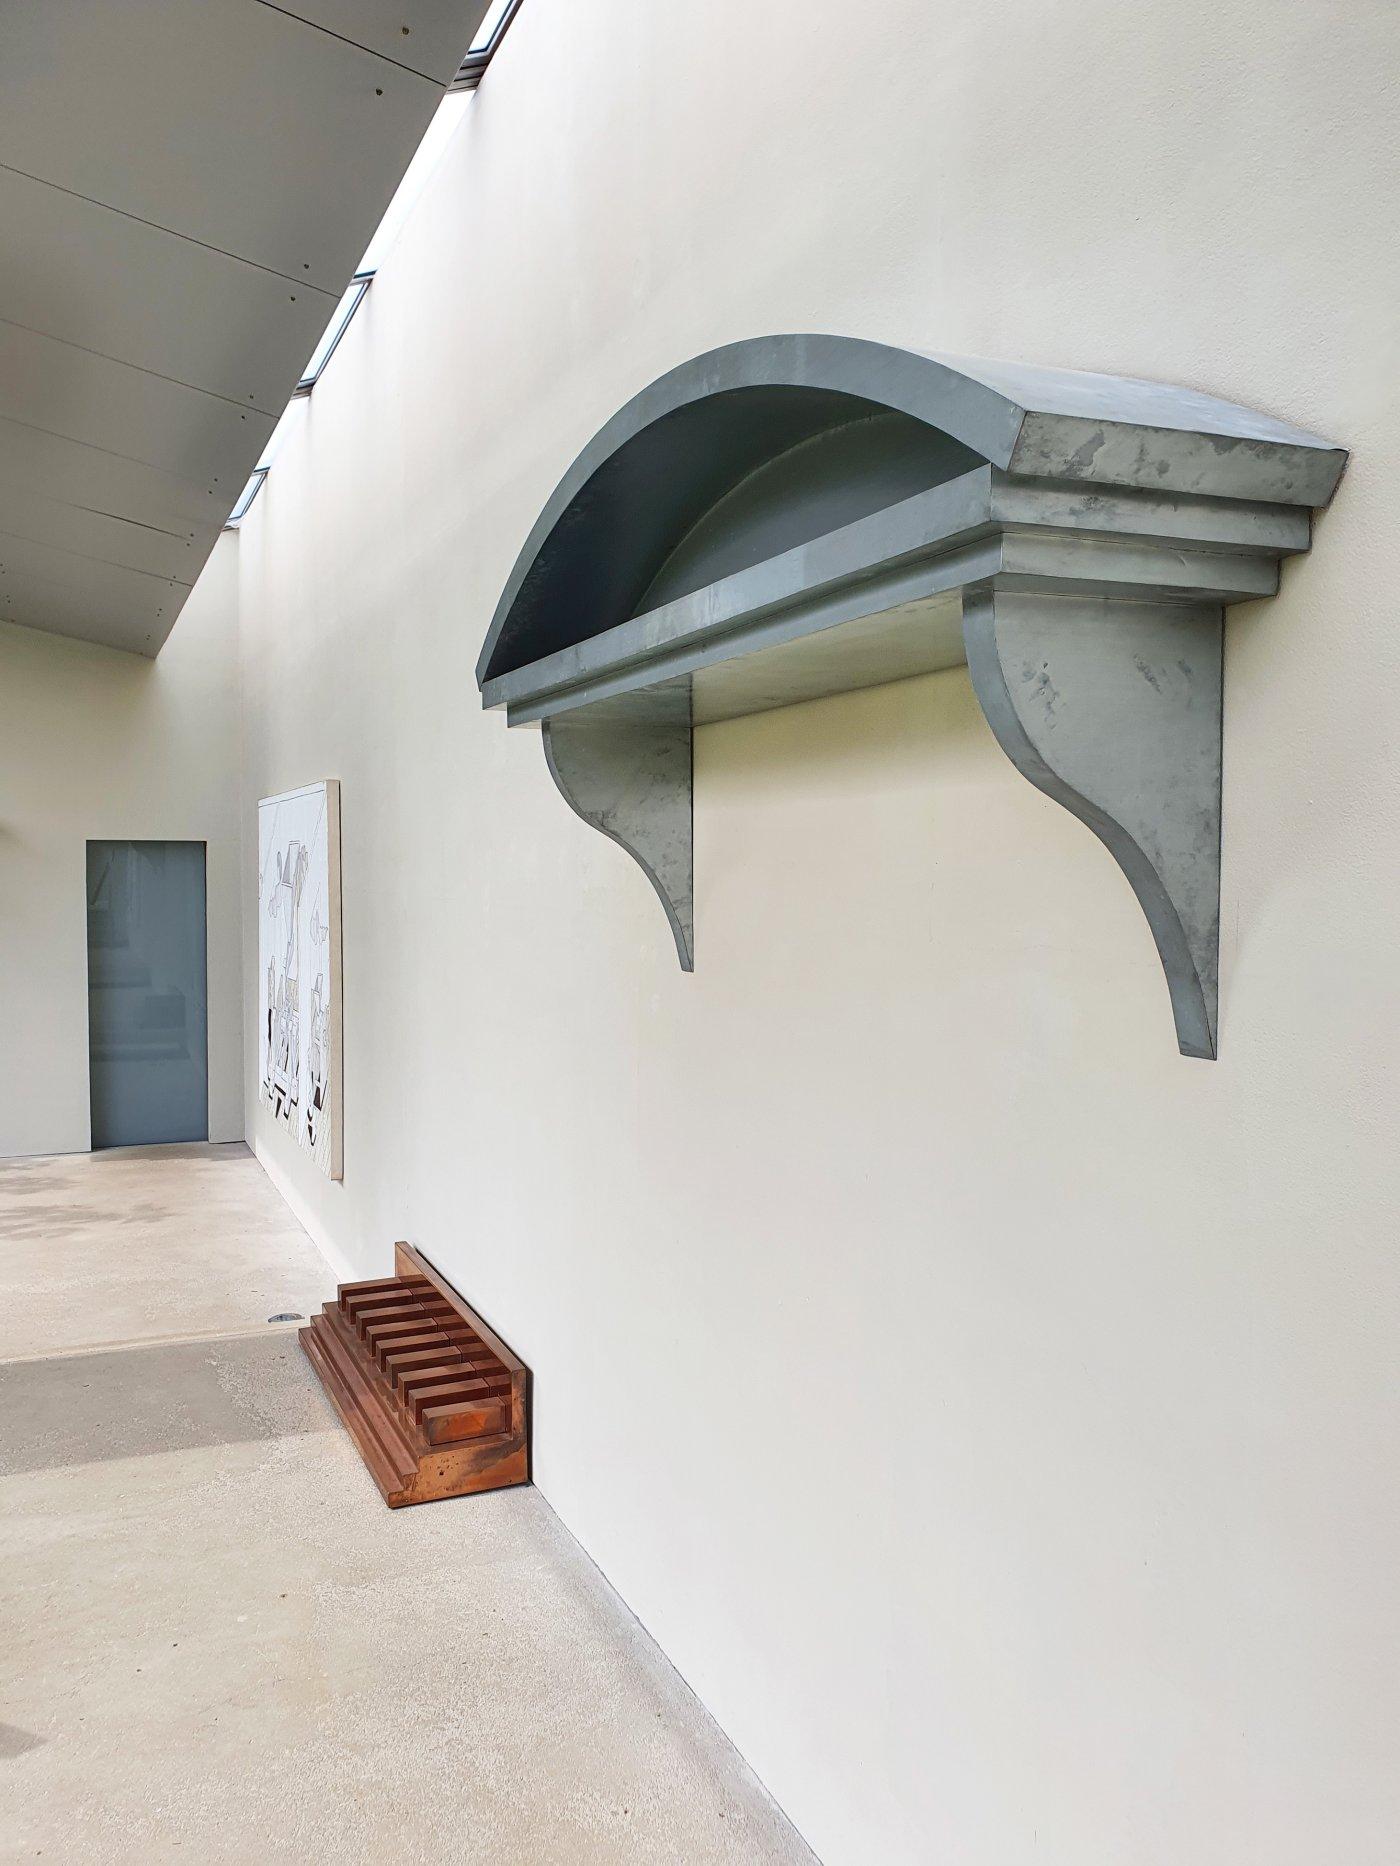 New Art Centre Edward Allington Nika Neelova 3